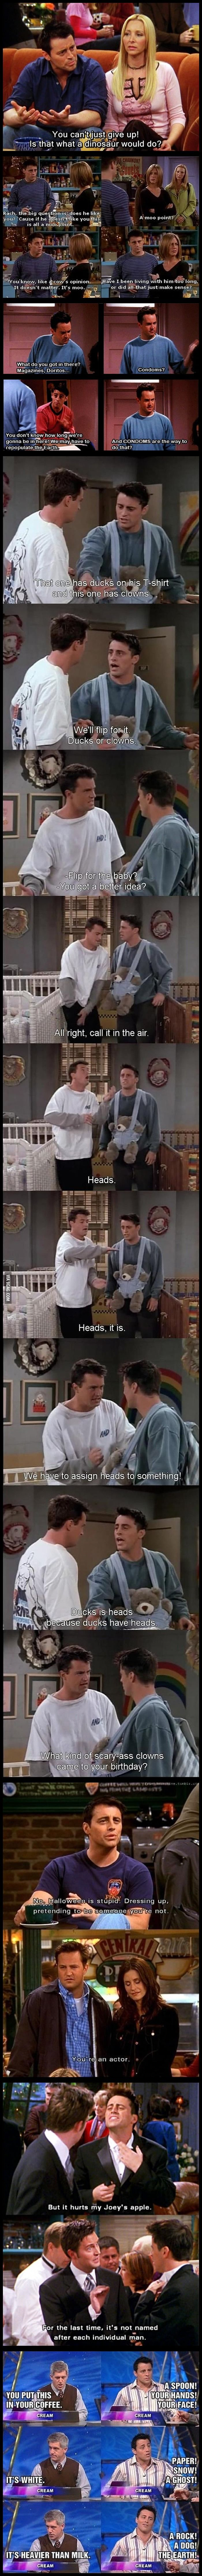 The Faultless Logic Of Joey haha